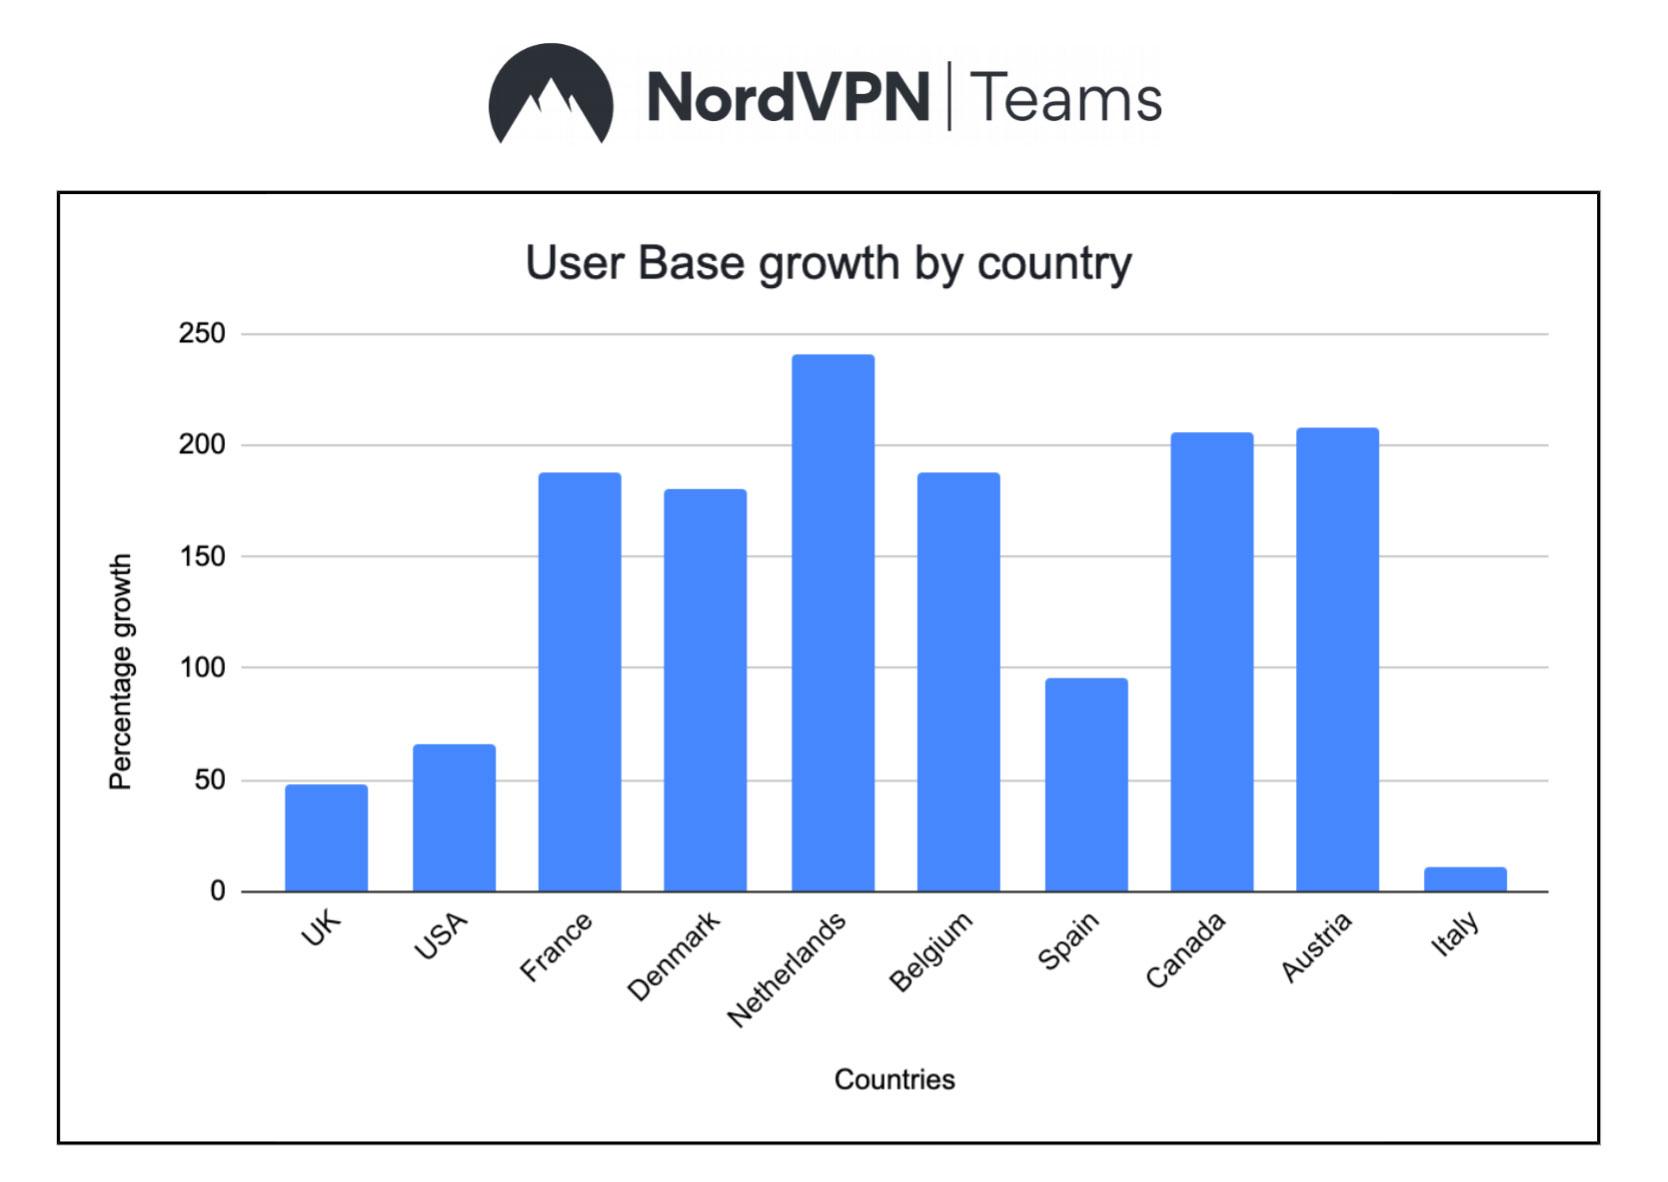 NordVPN Teams